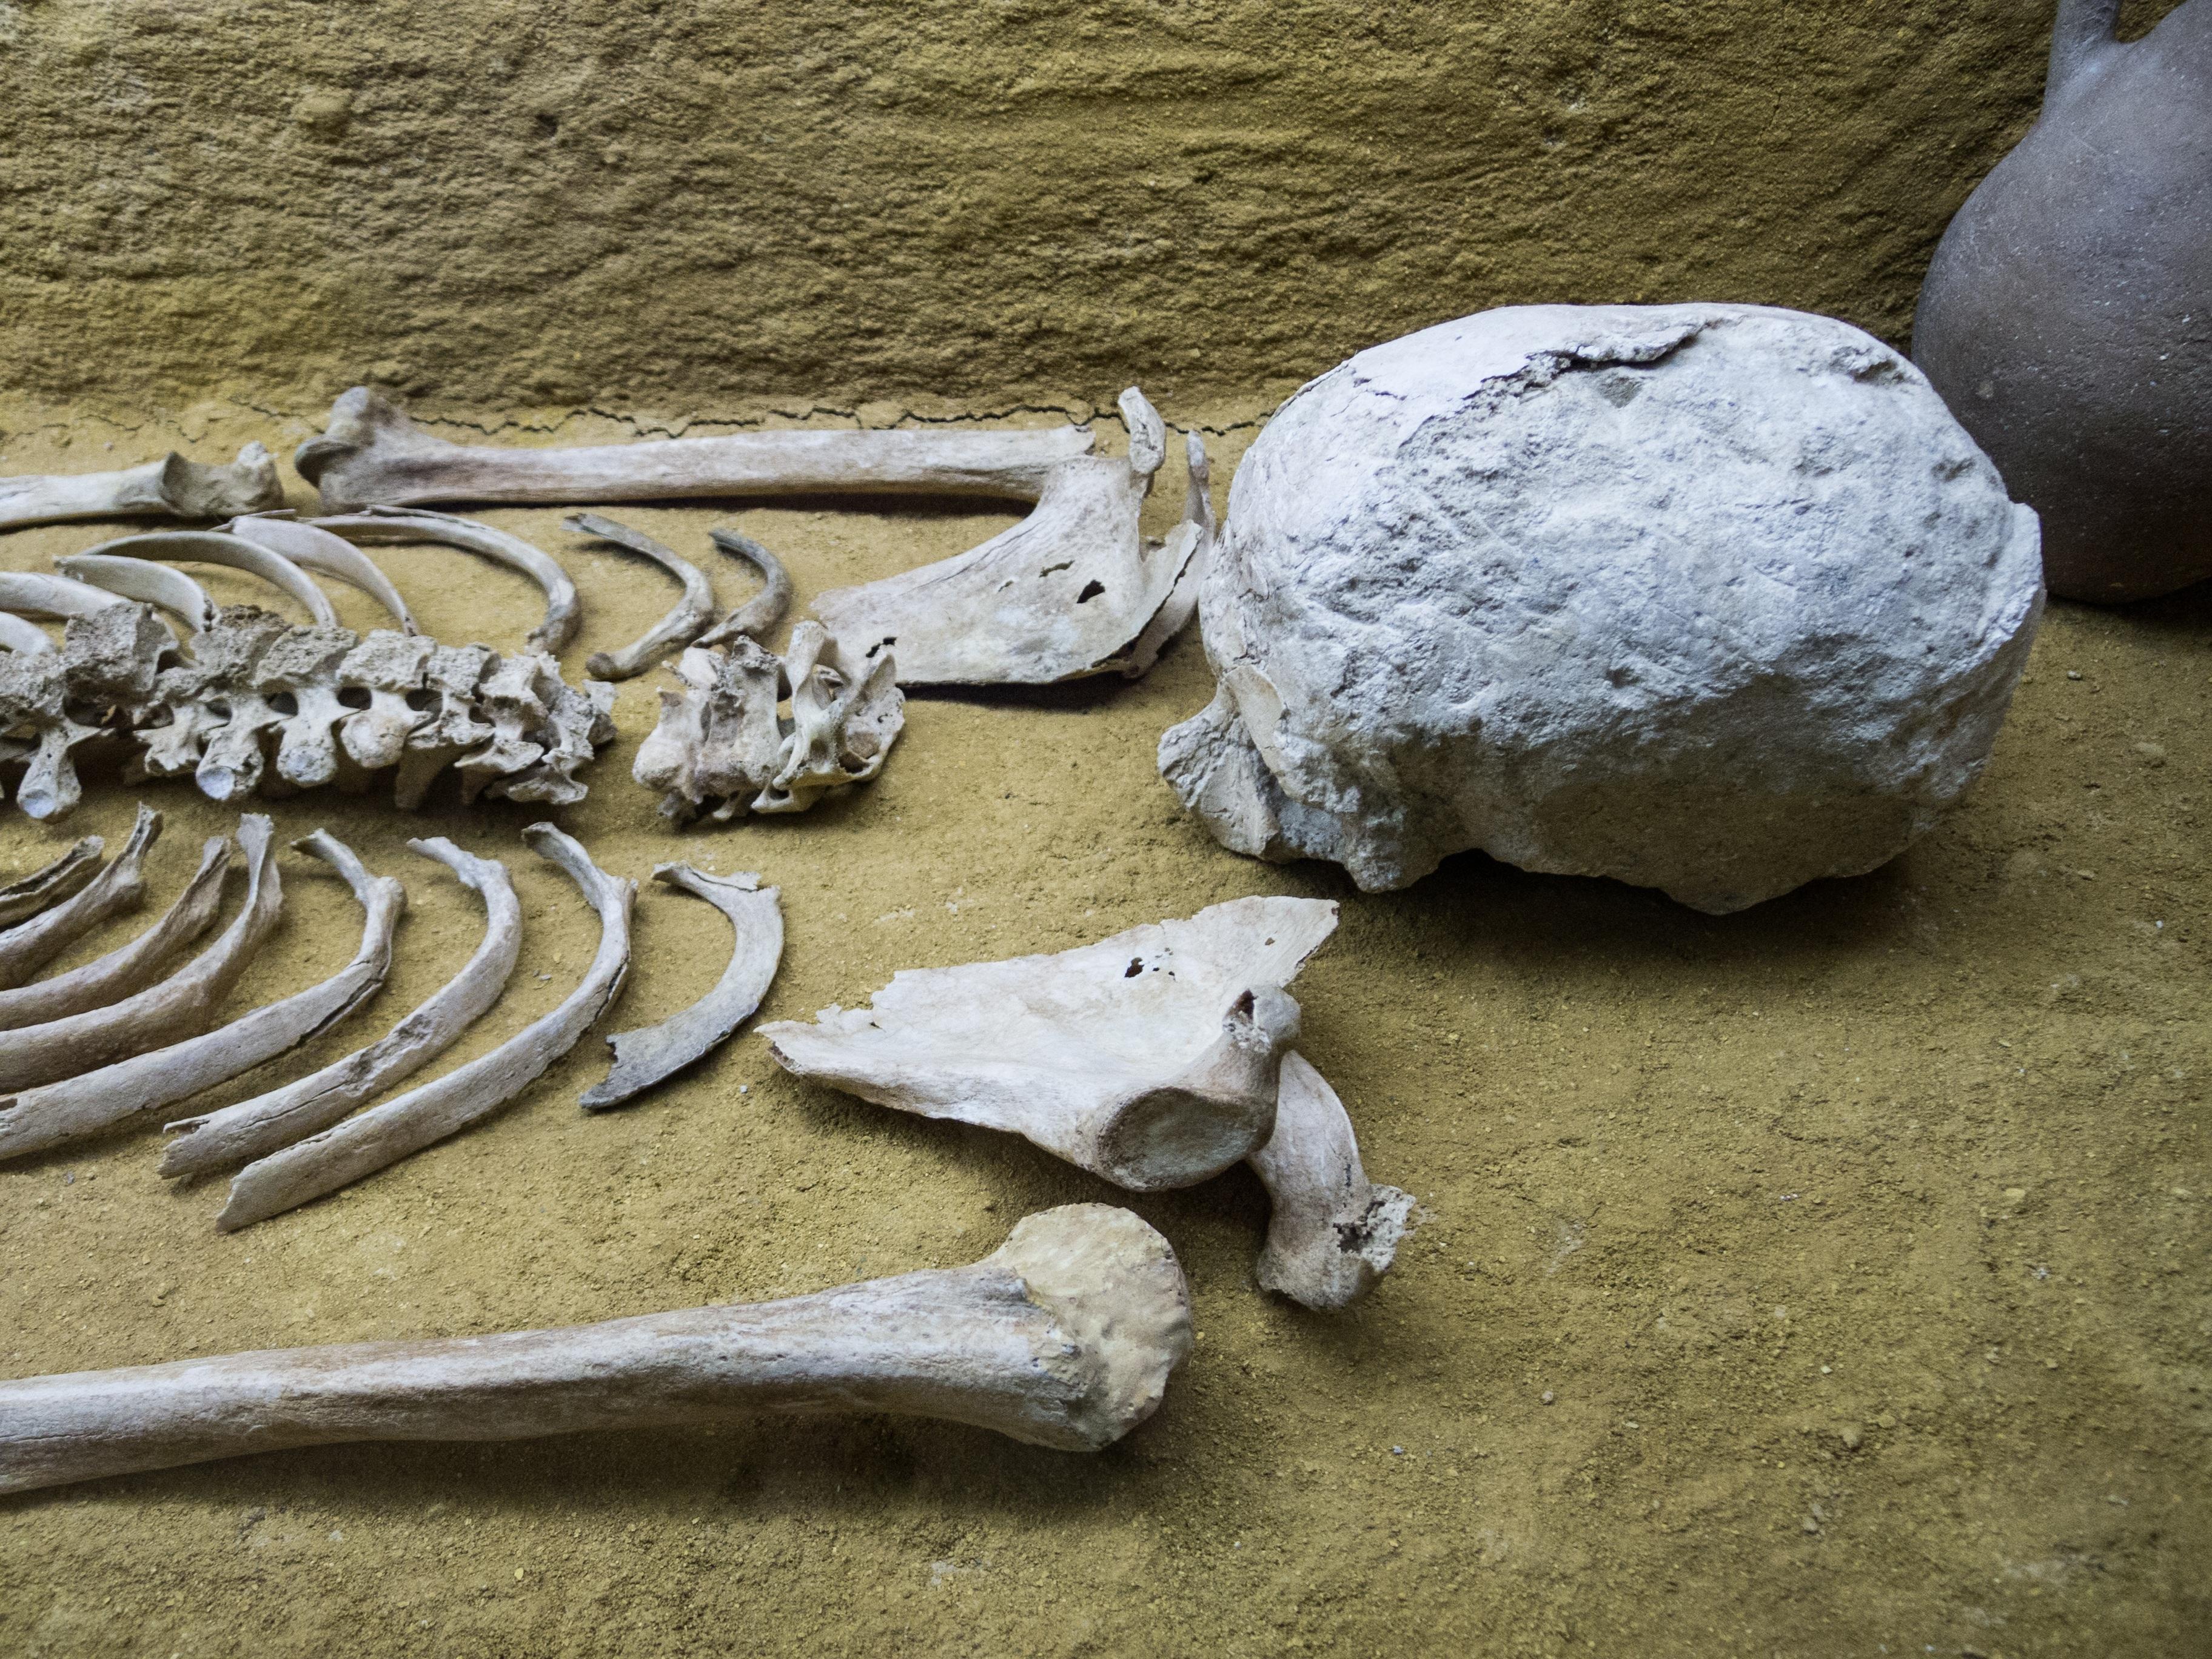 Fotos gratis : arena, rock, madera, museo, muerto, muerte, cráneo ...